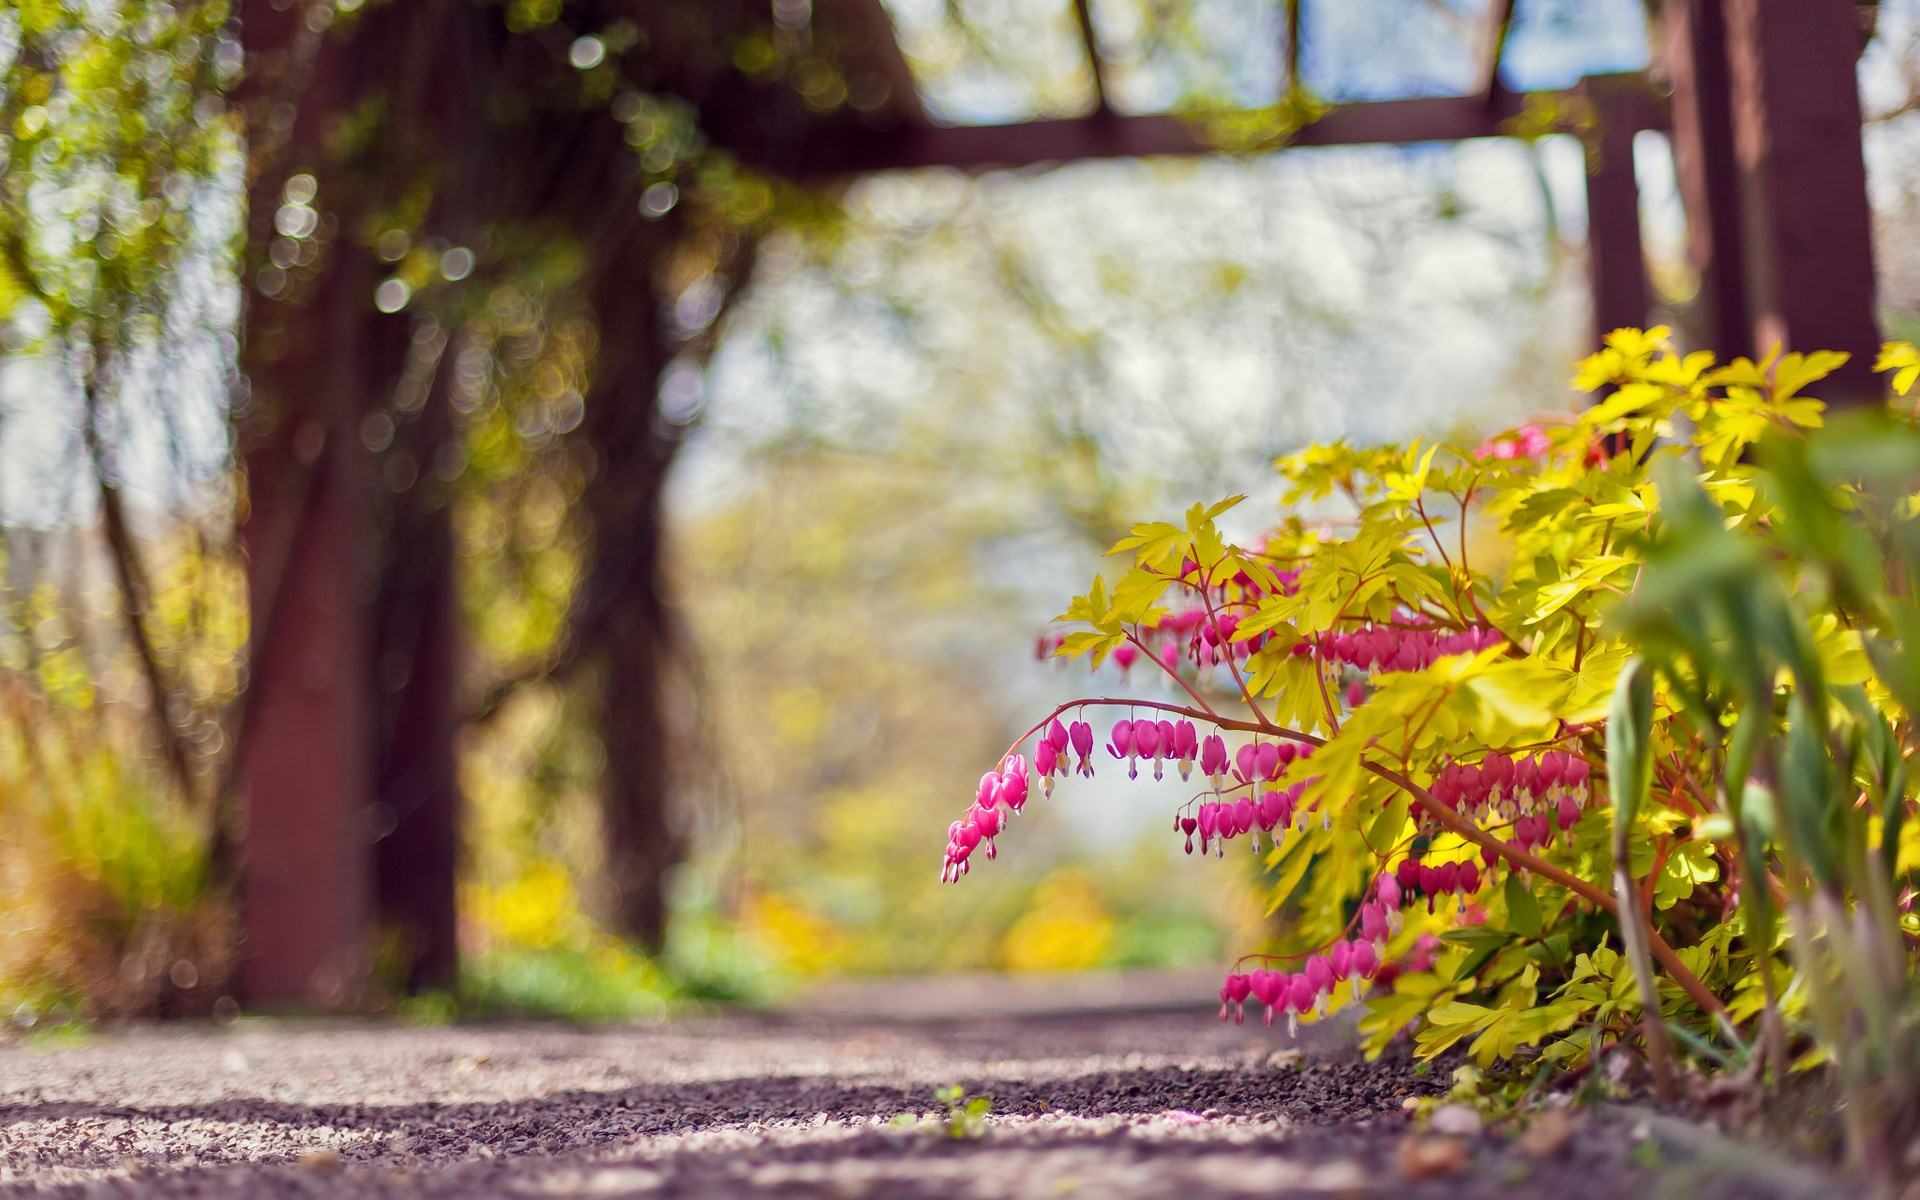 Trail Flowers Focus Nature